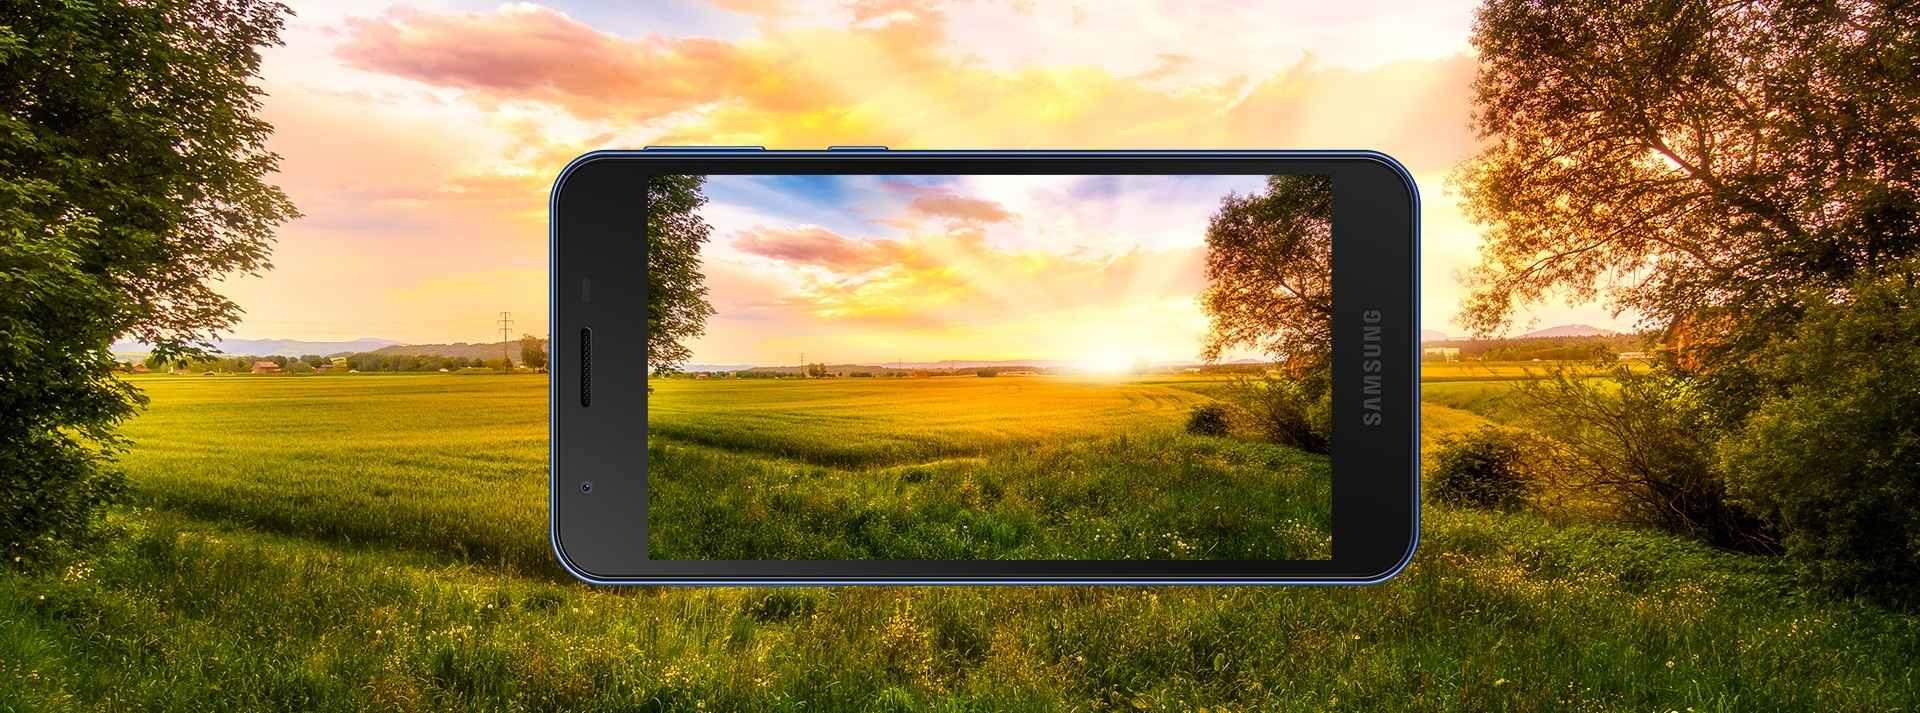 Ecran TFT qHD Samsung Galaxy A2 Core 5 pouces